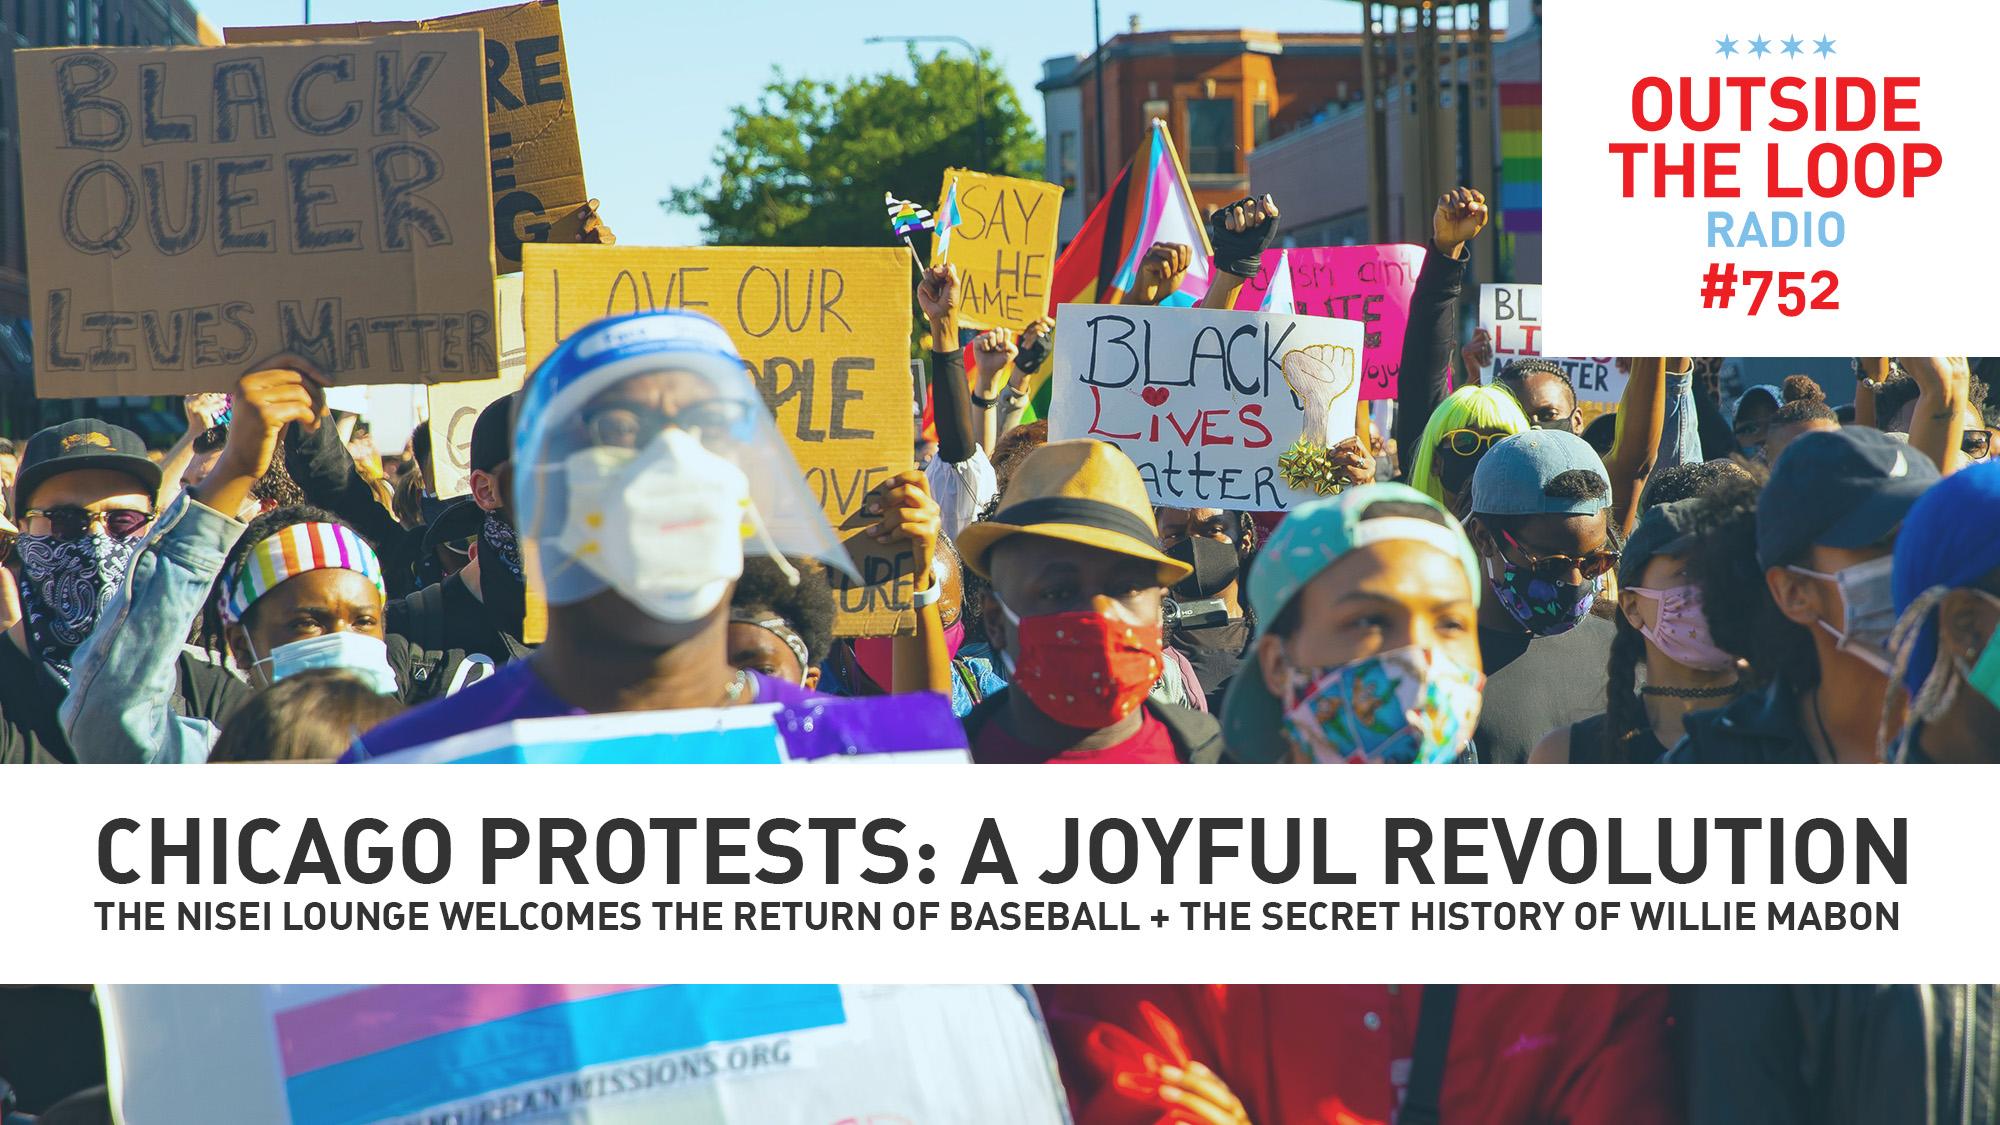 Vashon Jordan Jr. documents local protests. (Photo Credit: Vashon Jordan Jr. Used with permission.)